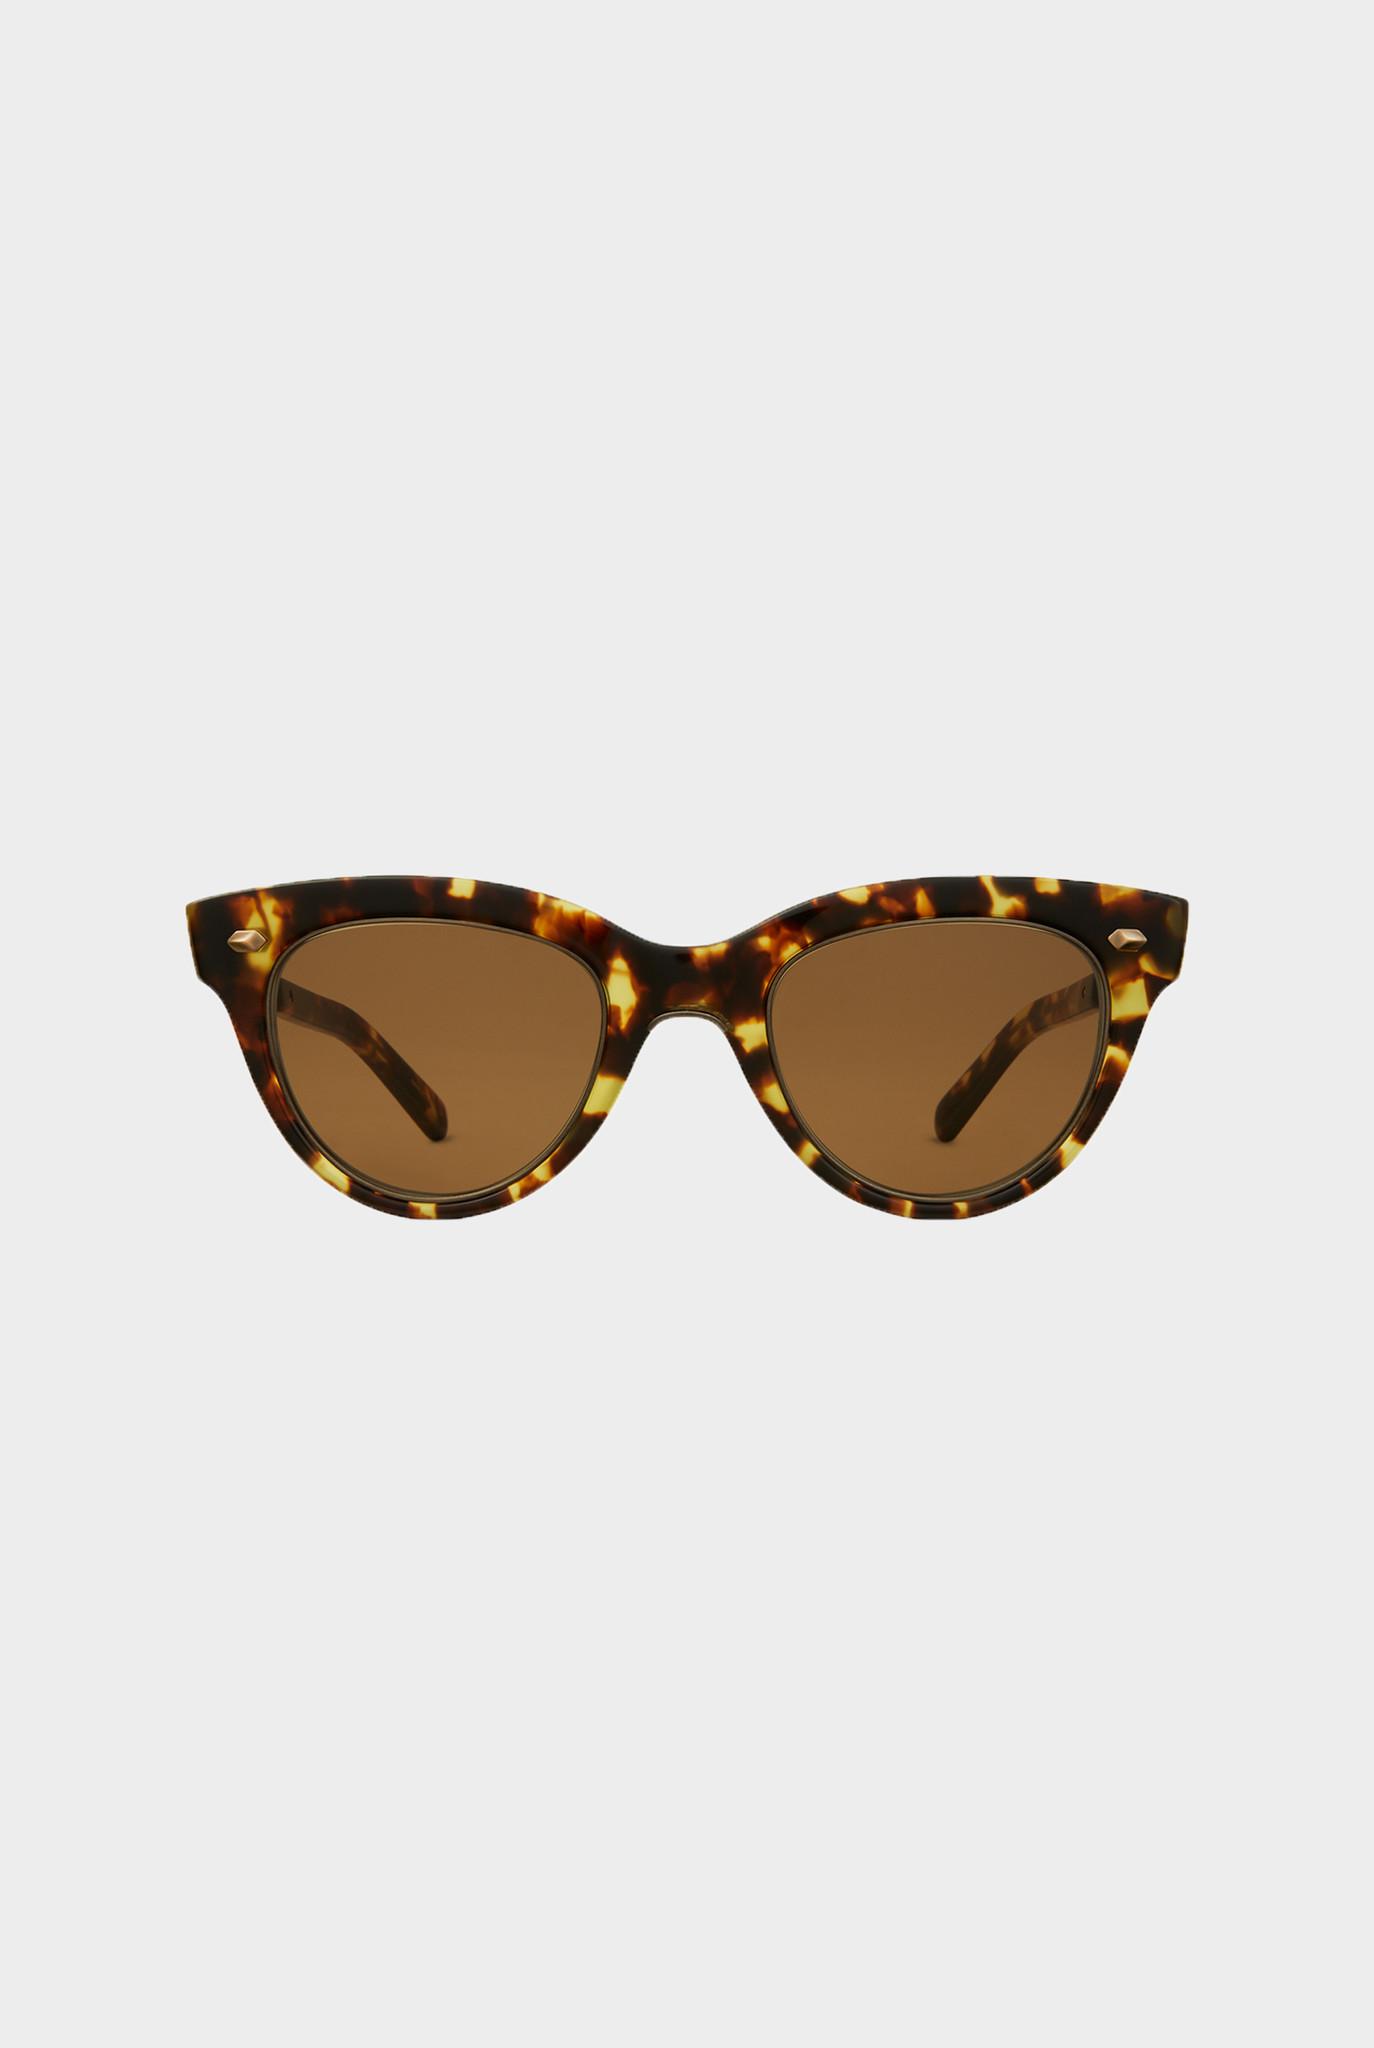 Madison S47 Tortoise-Antique Gold/Semi Flat Brown